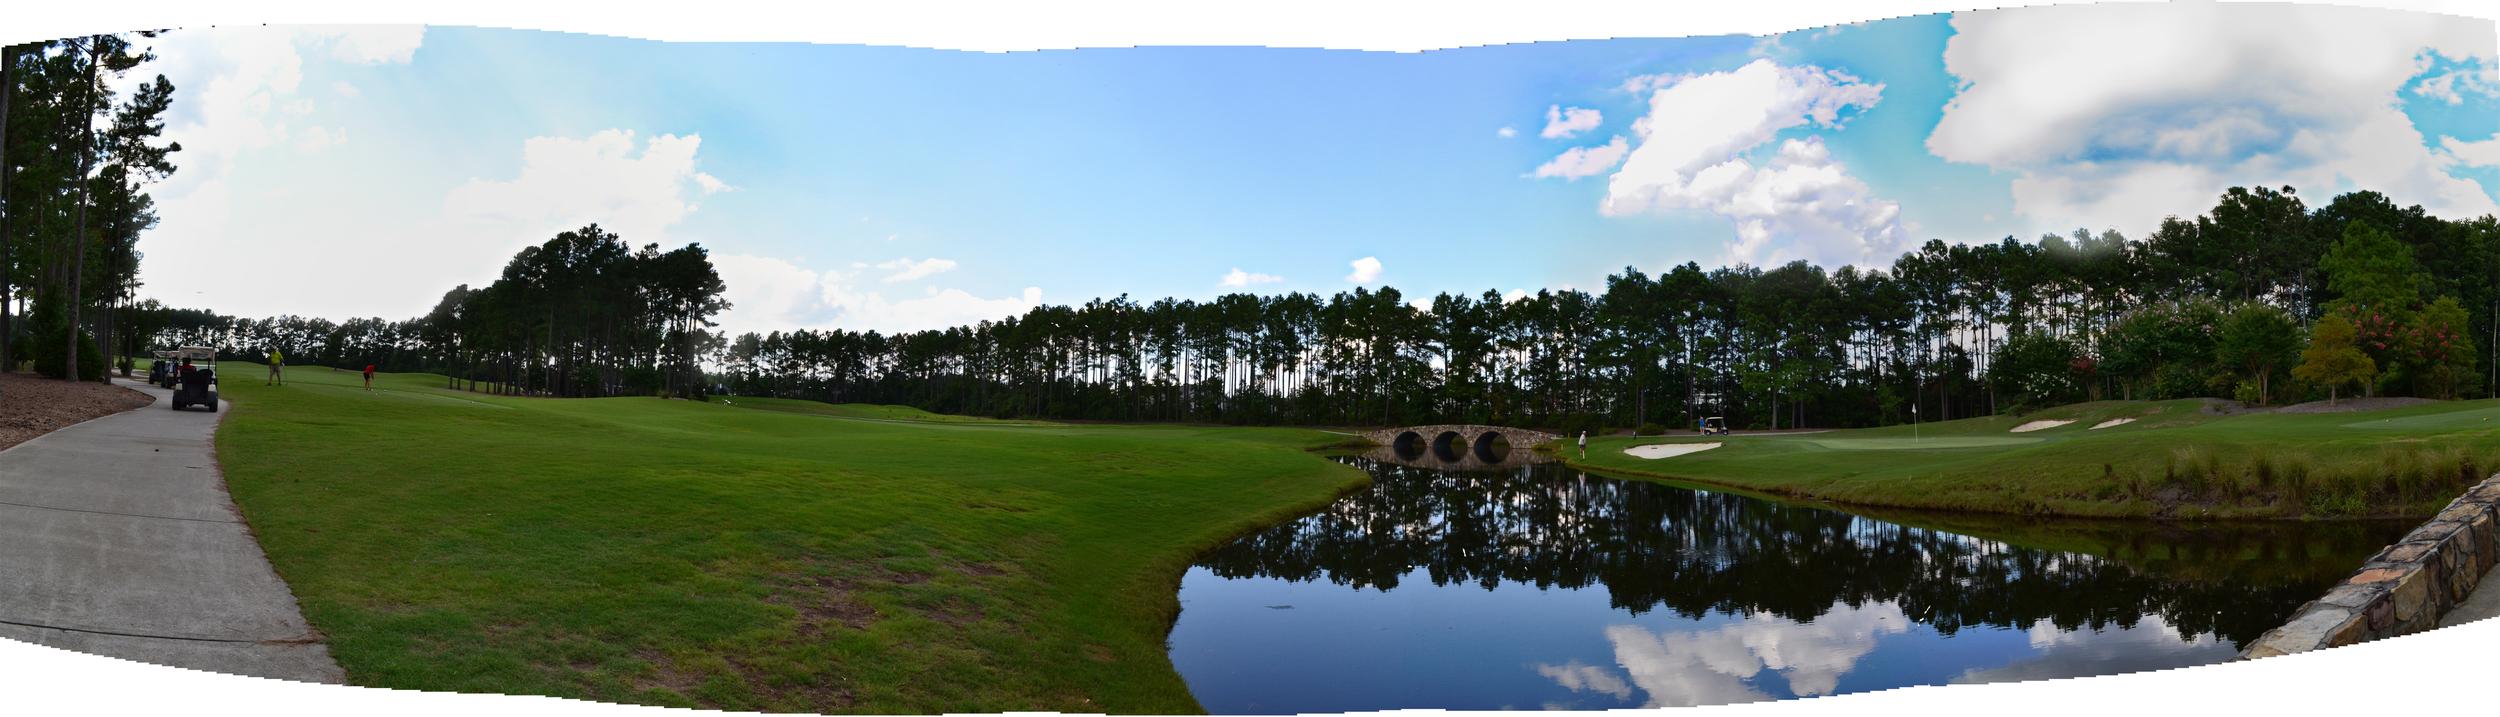 World Tour Golf Course, Myrtle Beach, SC, July 2014